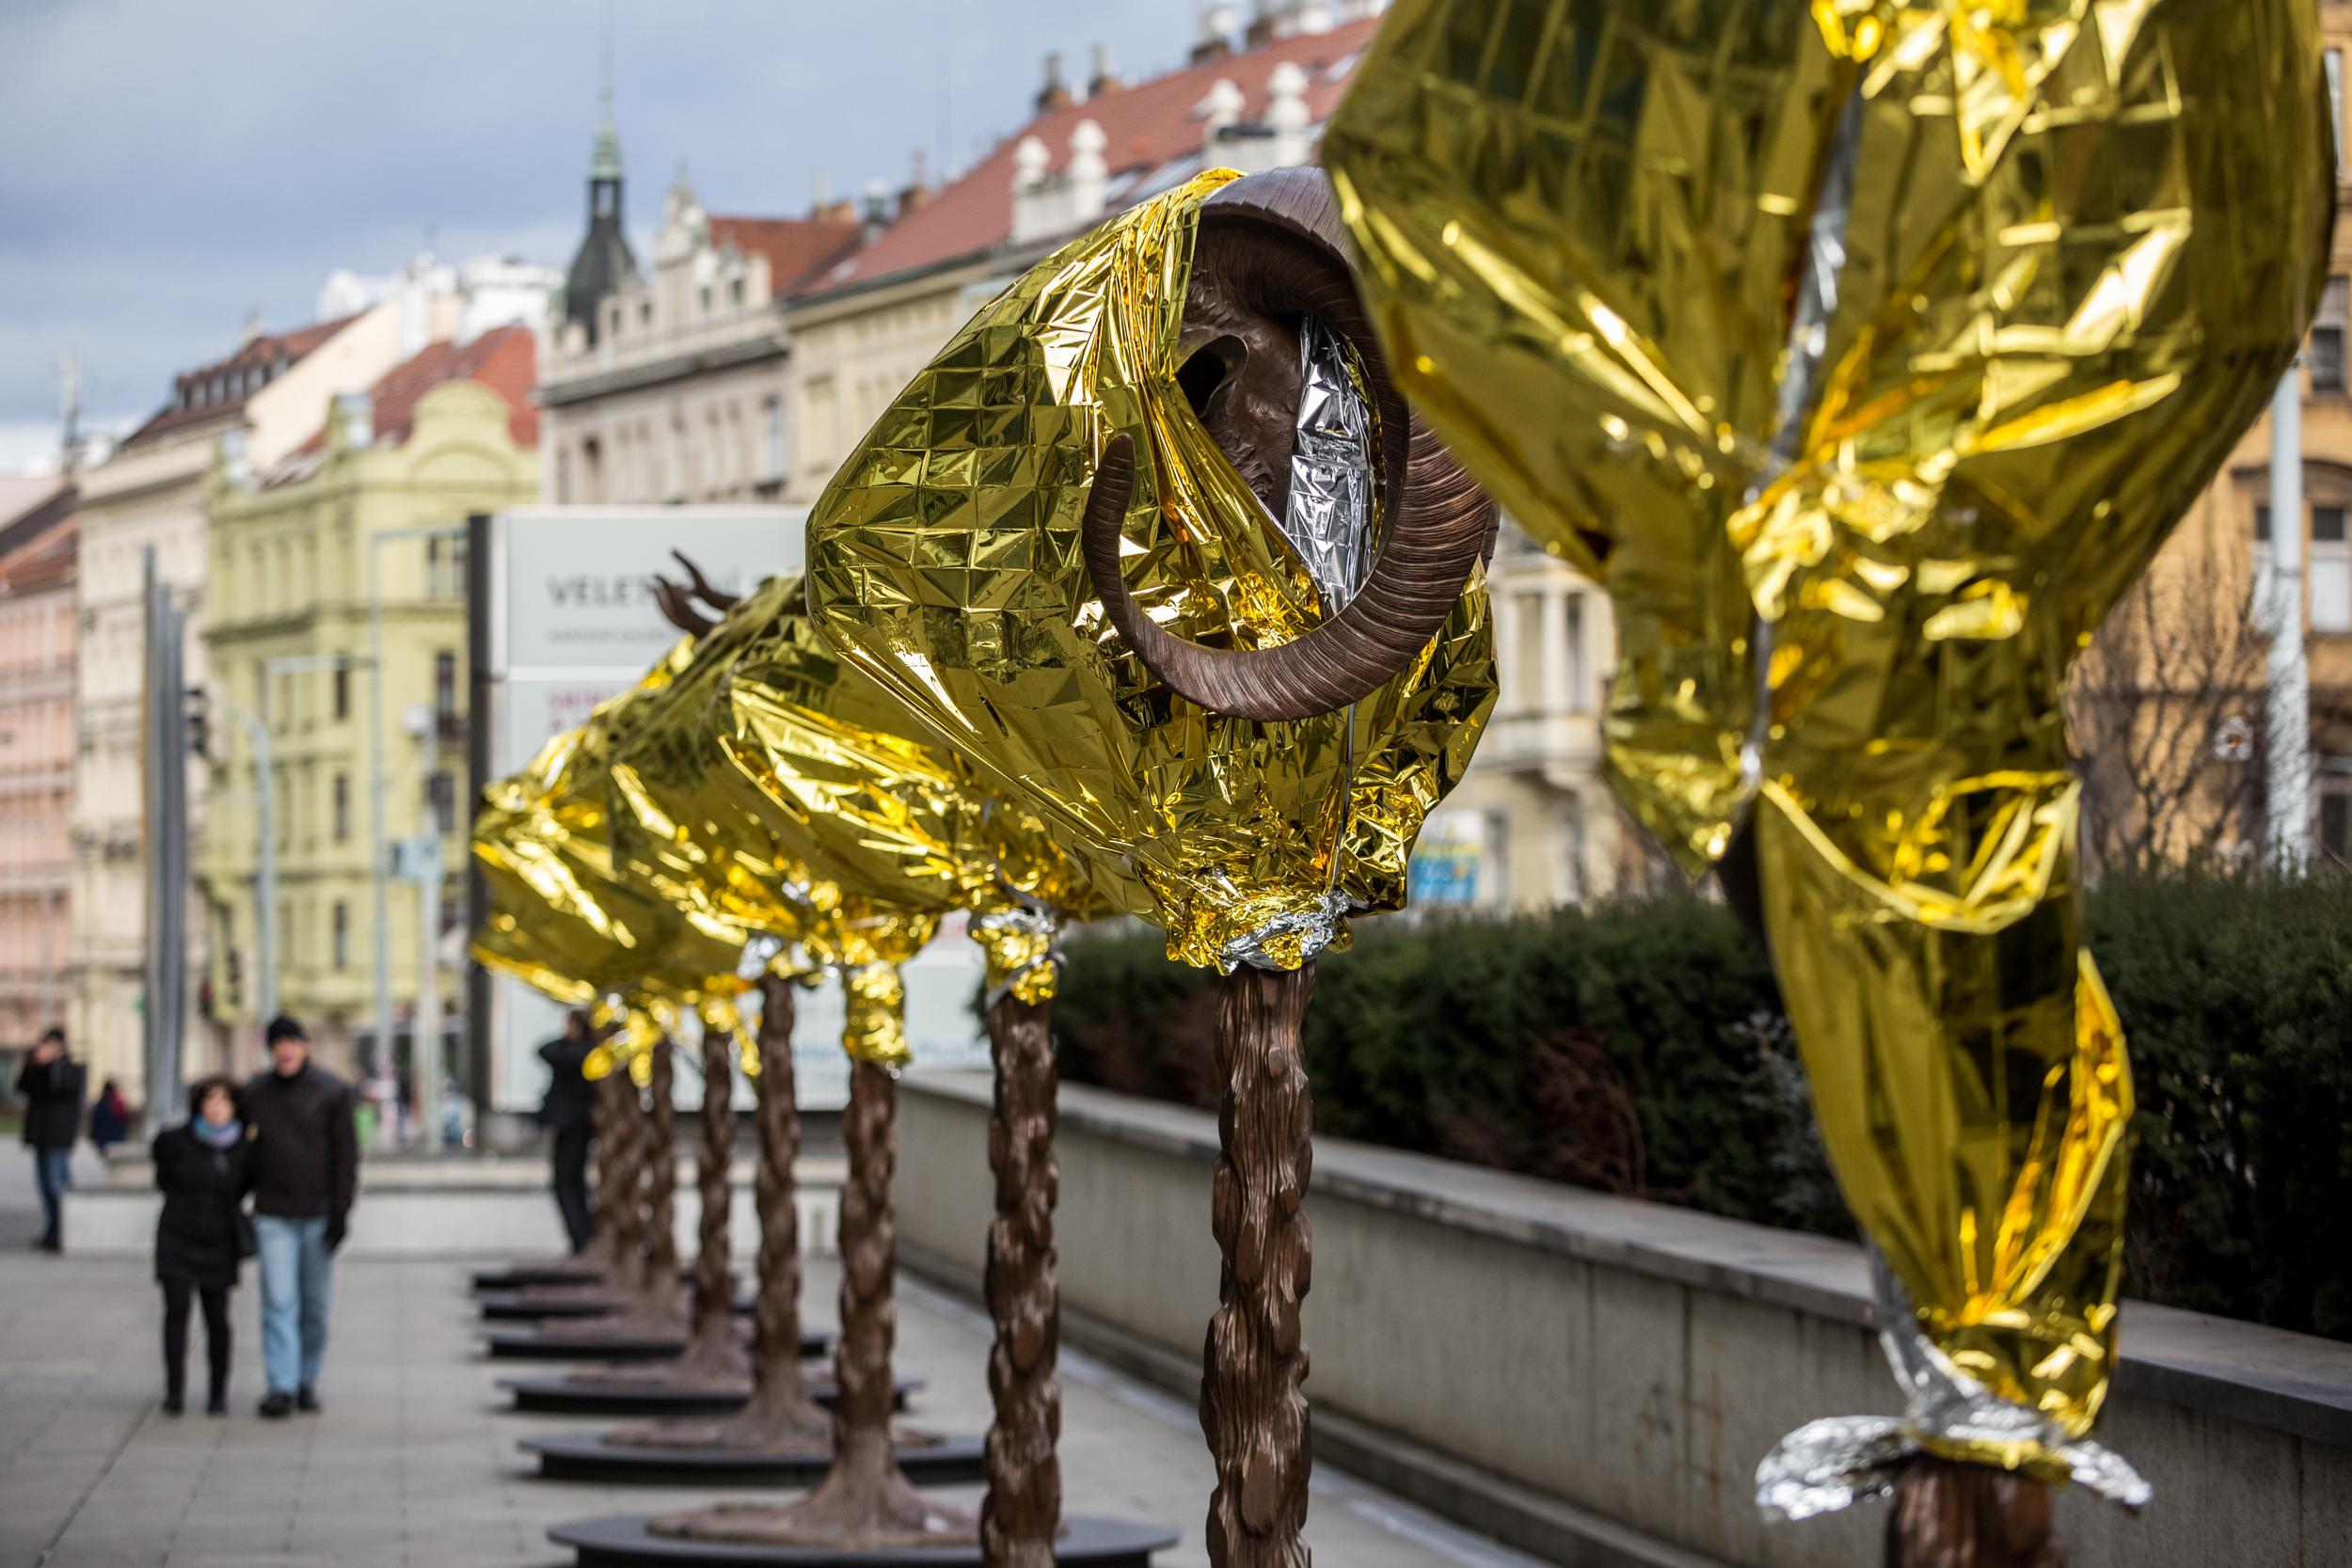 Zodiac Installation by Ai Weiwei in Prague, Czech Republic